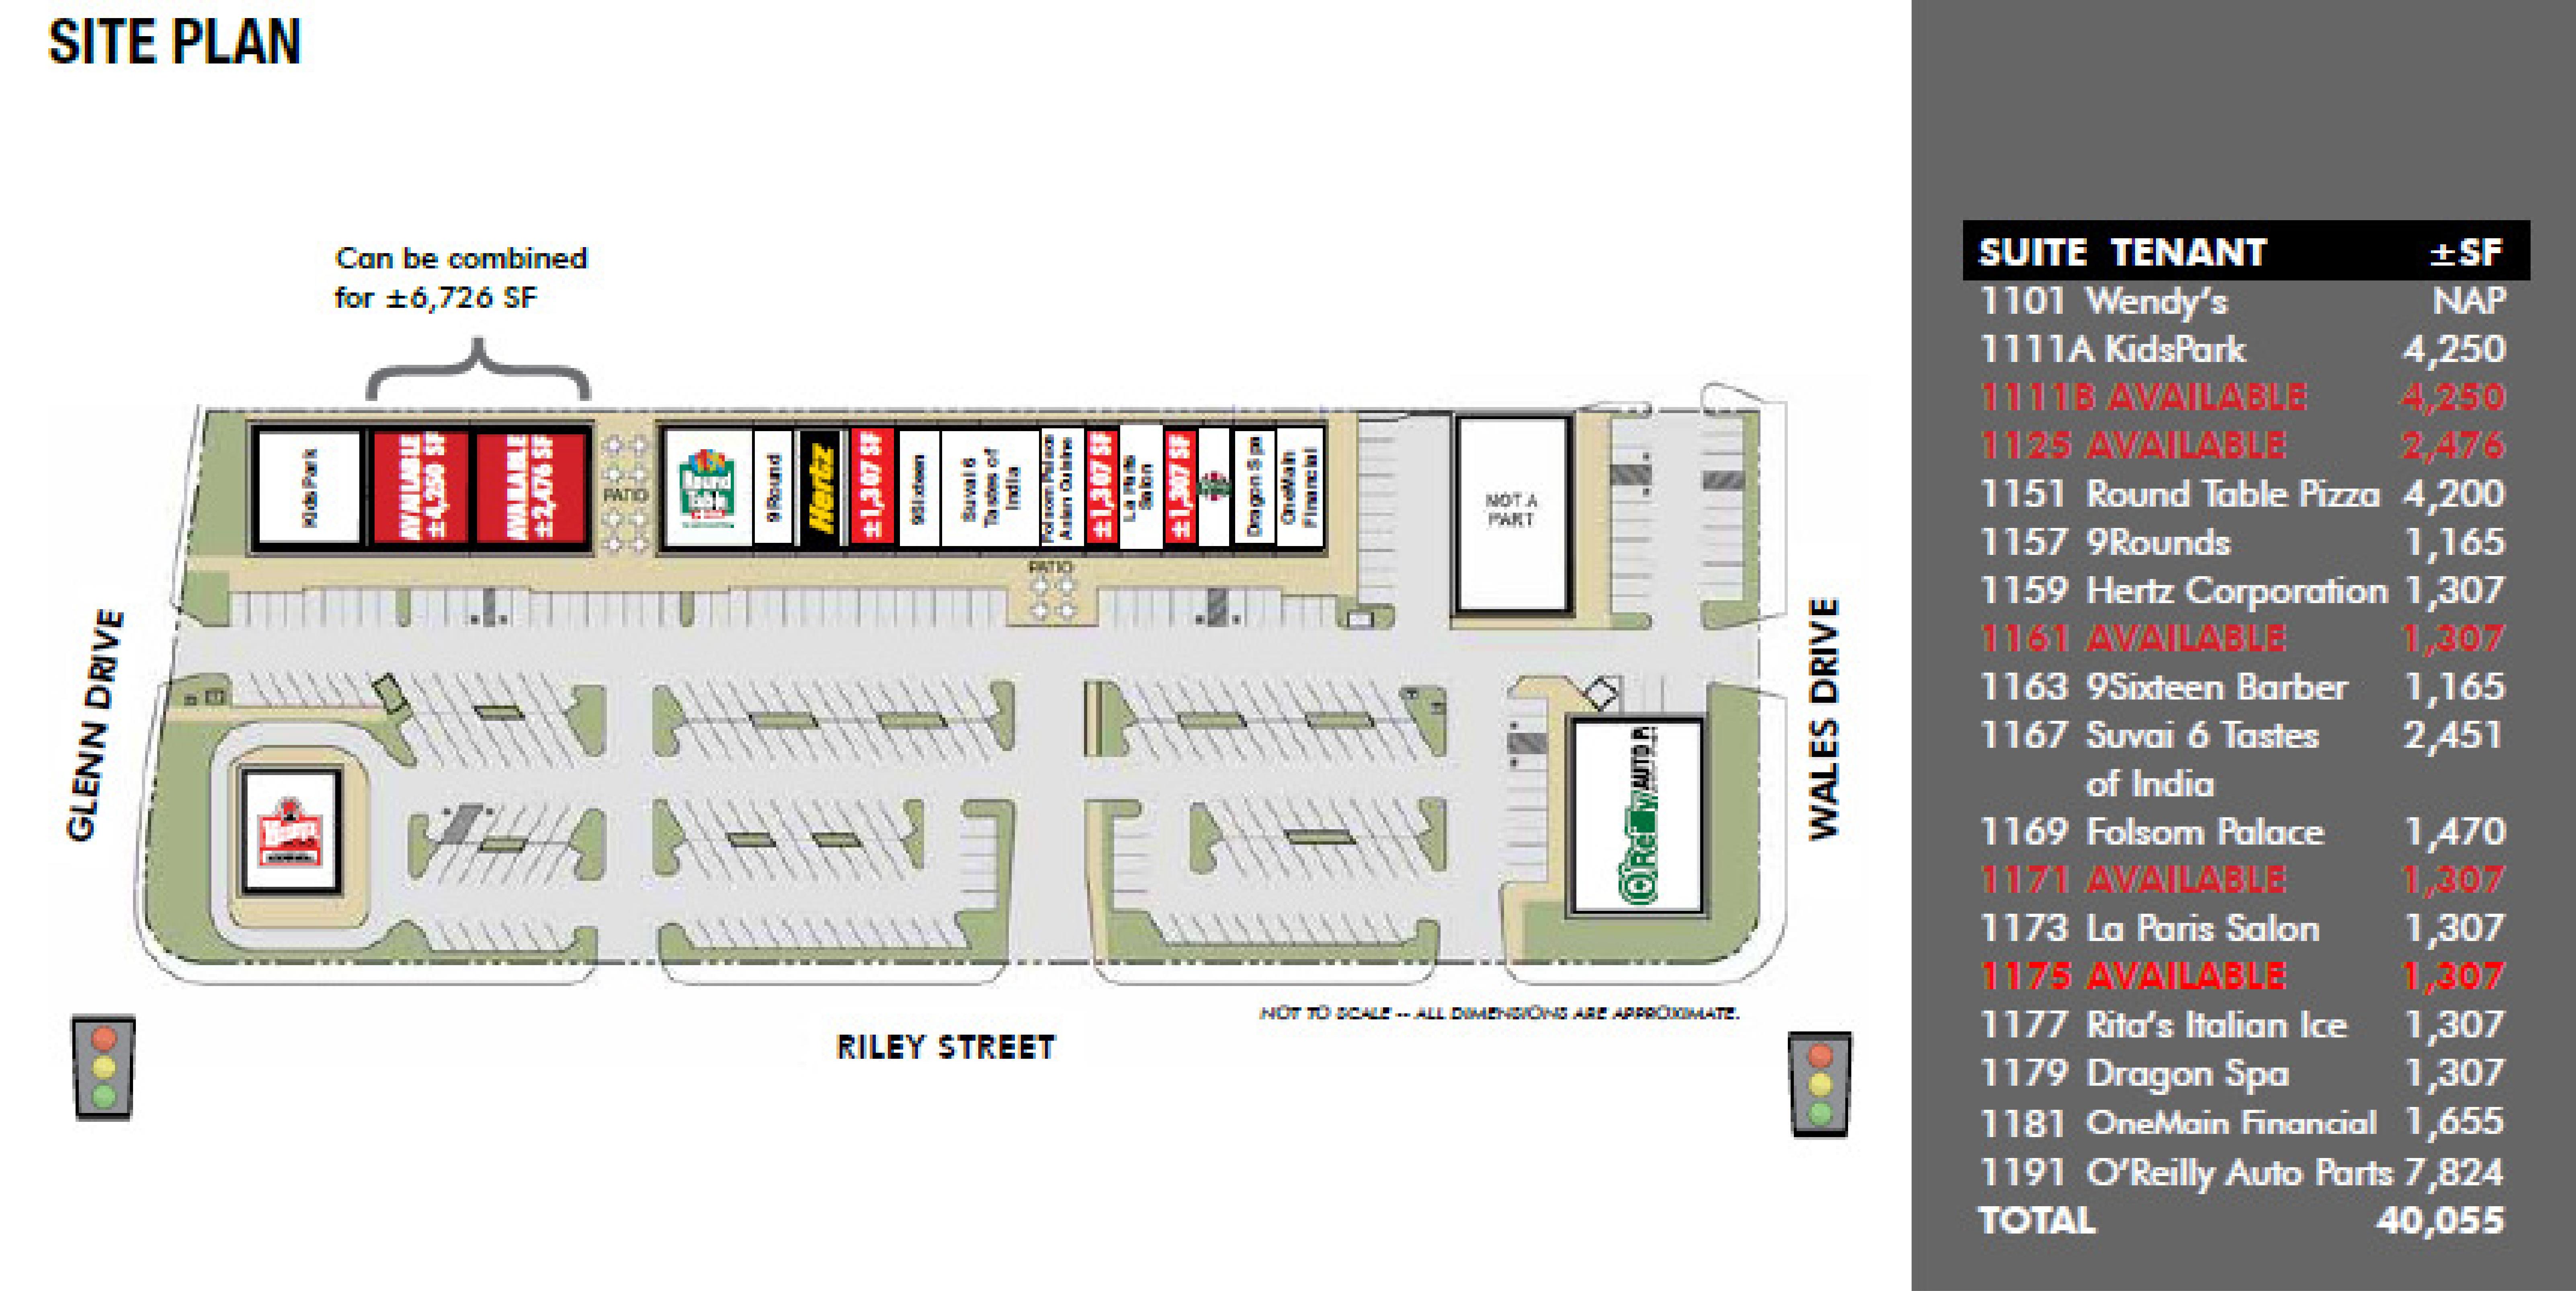 Folsom Central: site plan